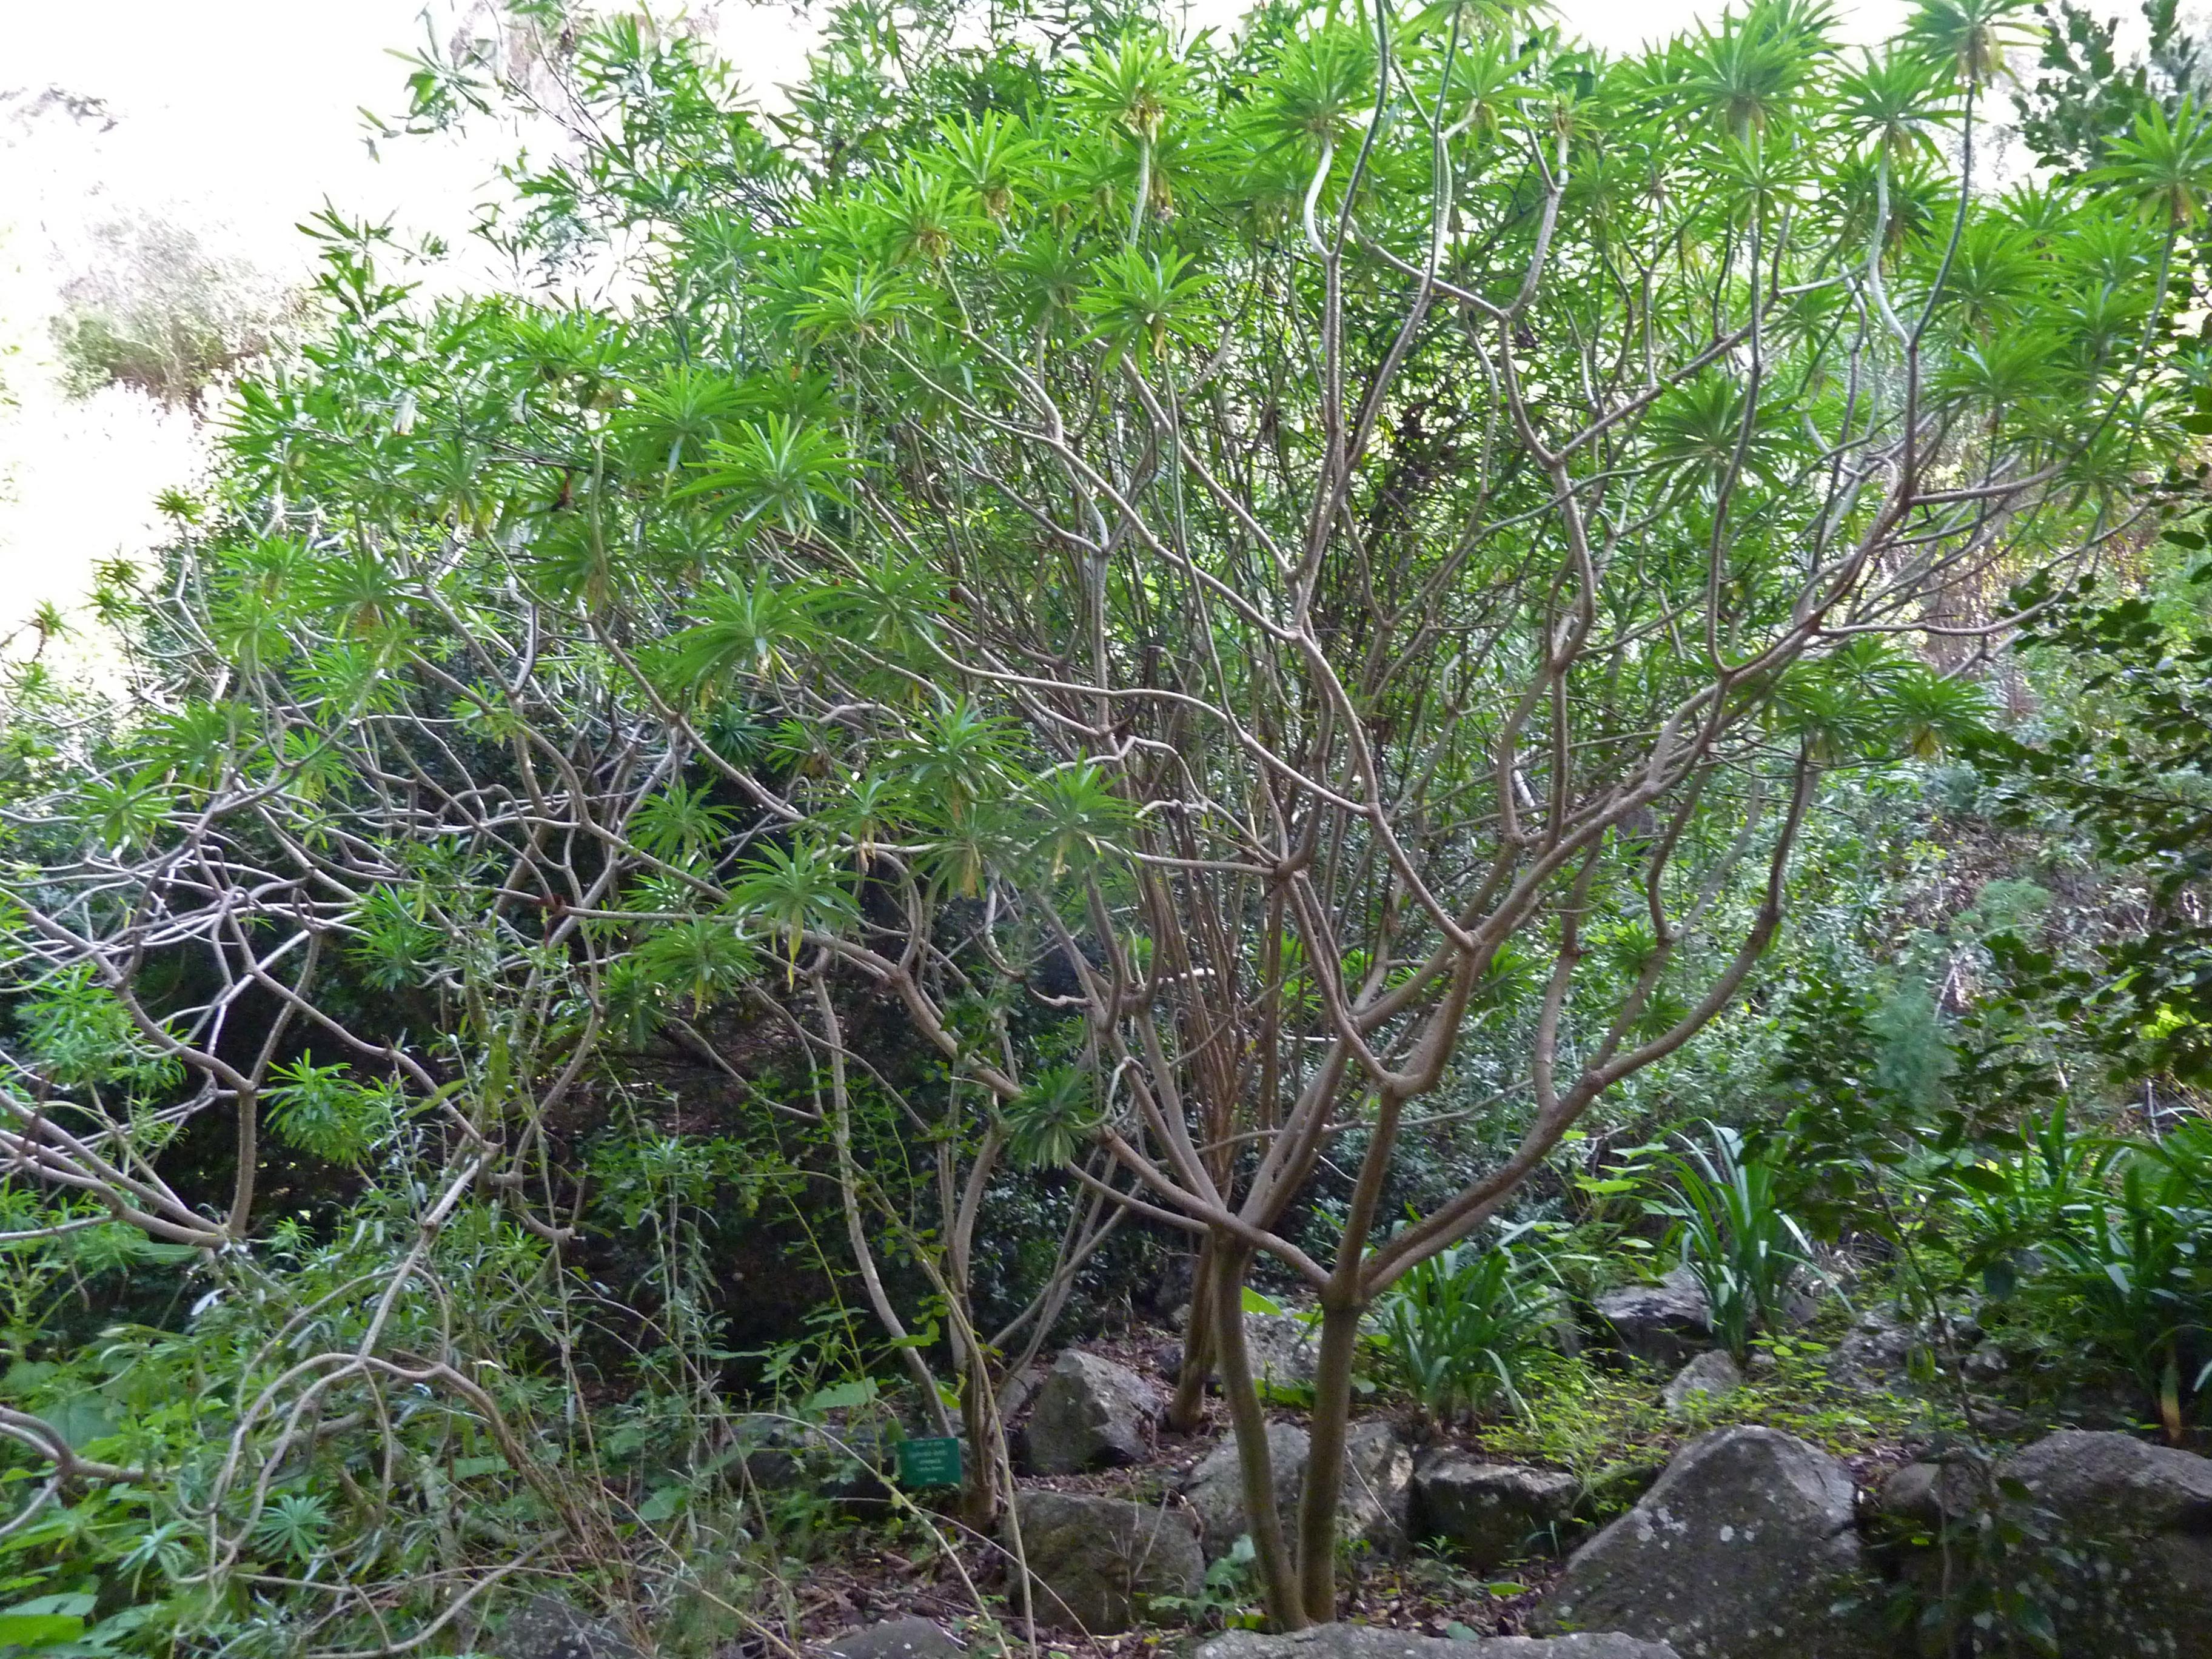 File euphorbia lambii jard n bot nico canario viera y clavijo jpg wikimedia commons - Jardin botanico canario ...